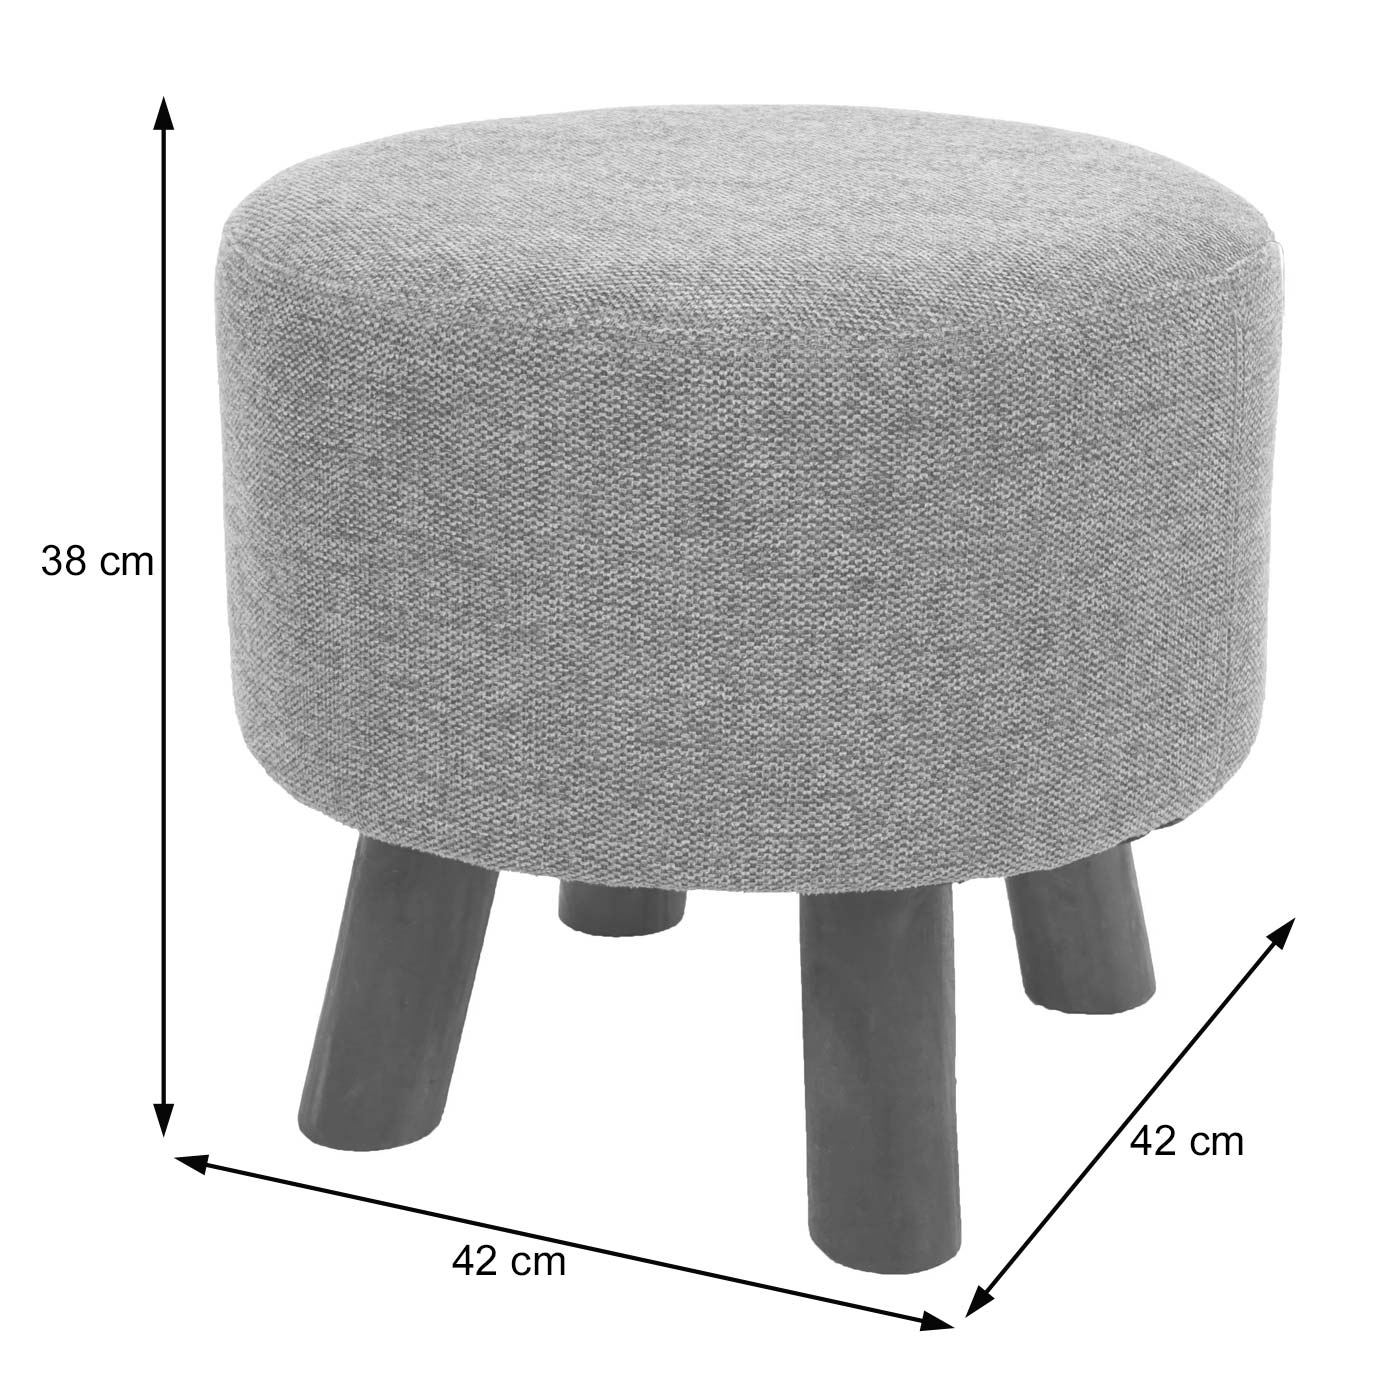 Sitzhocker HWC-C29 Bemaßungsbild